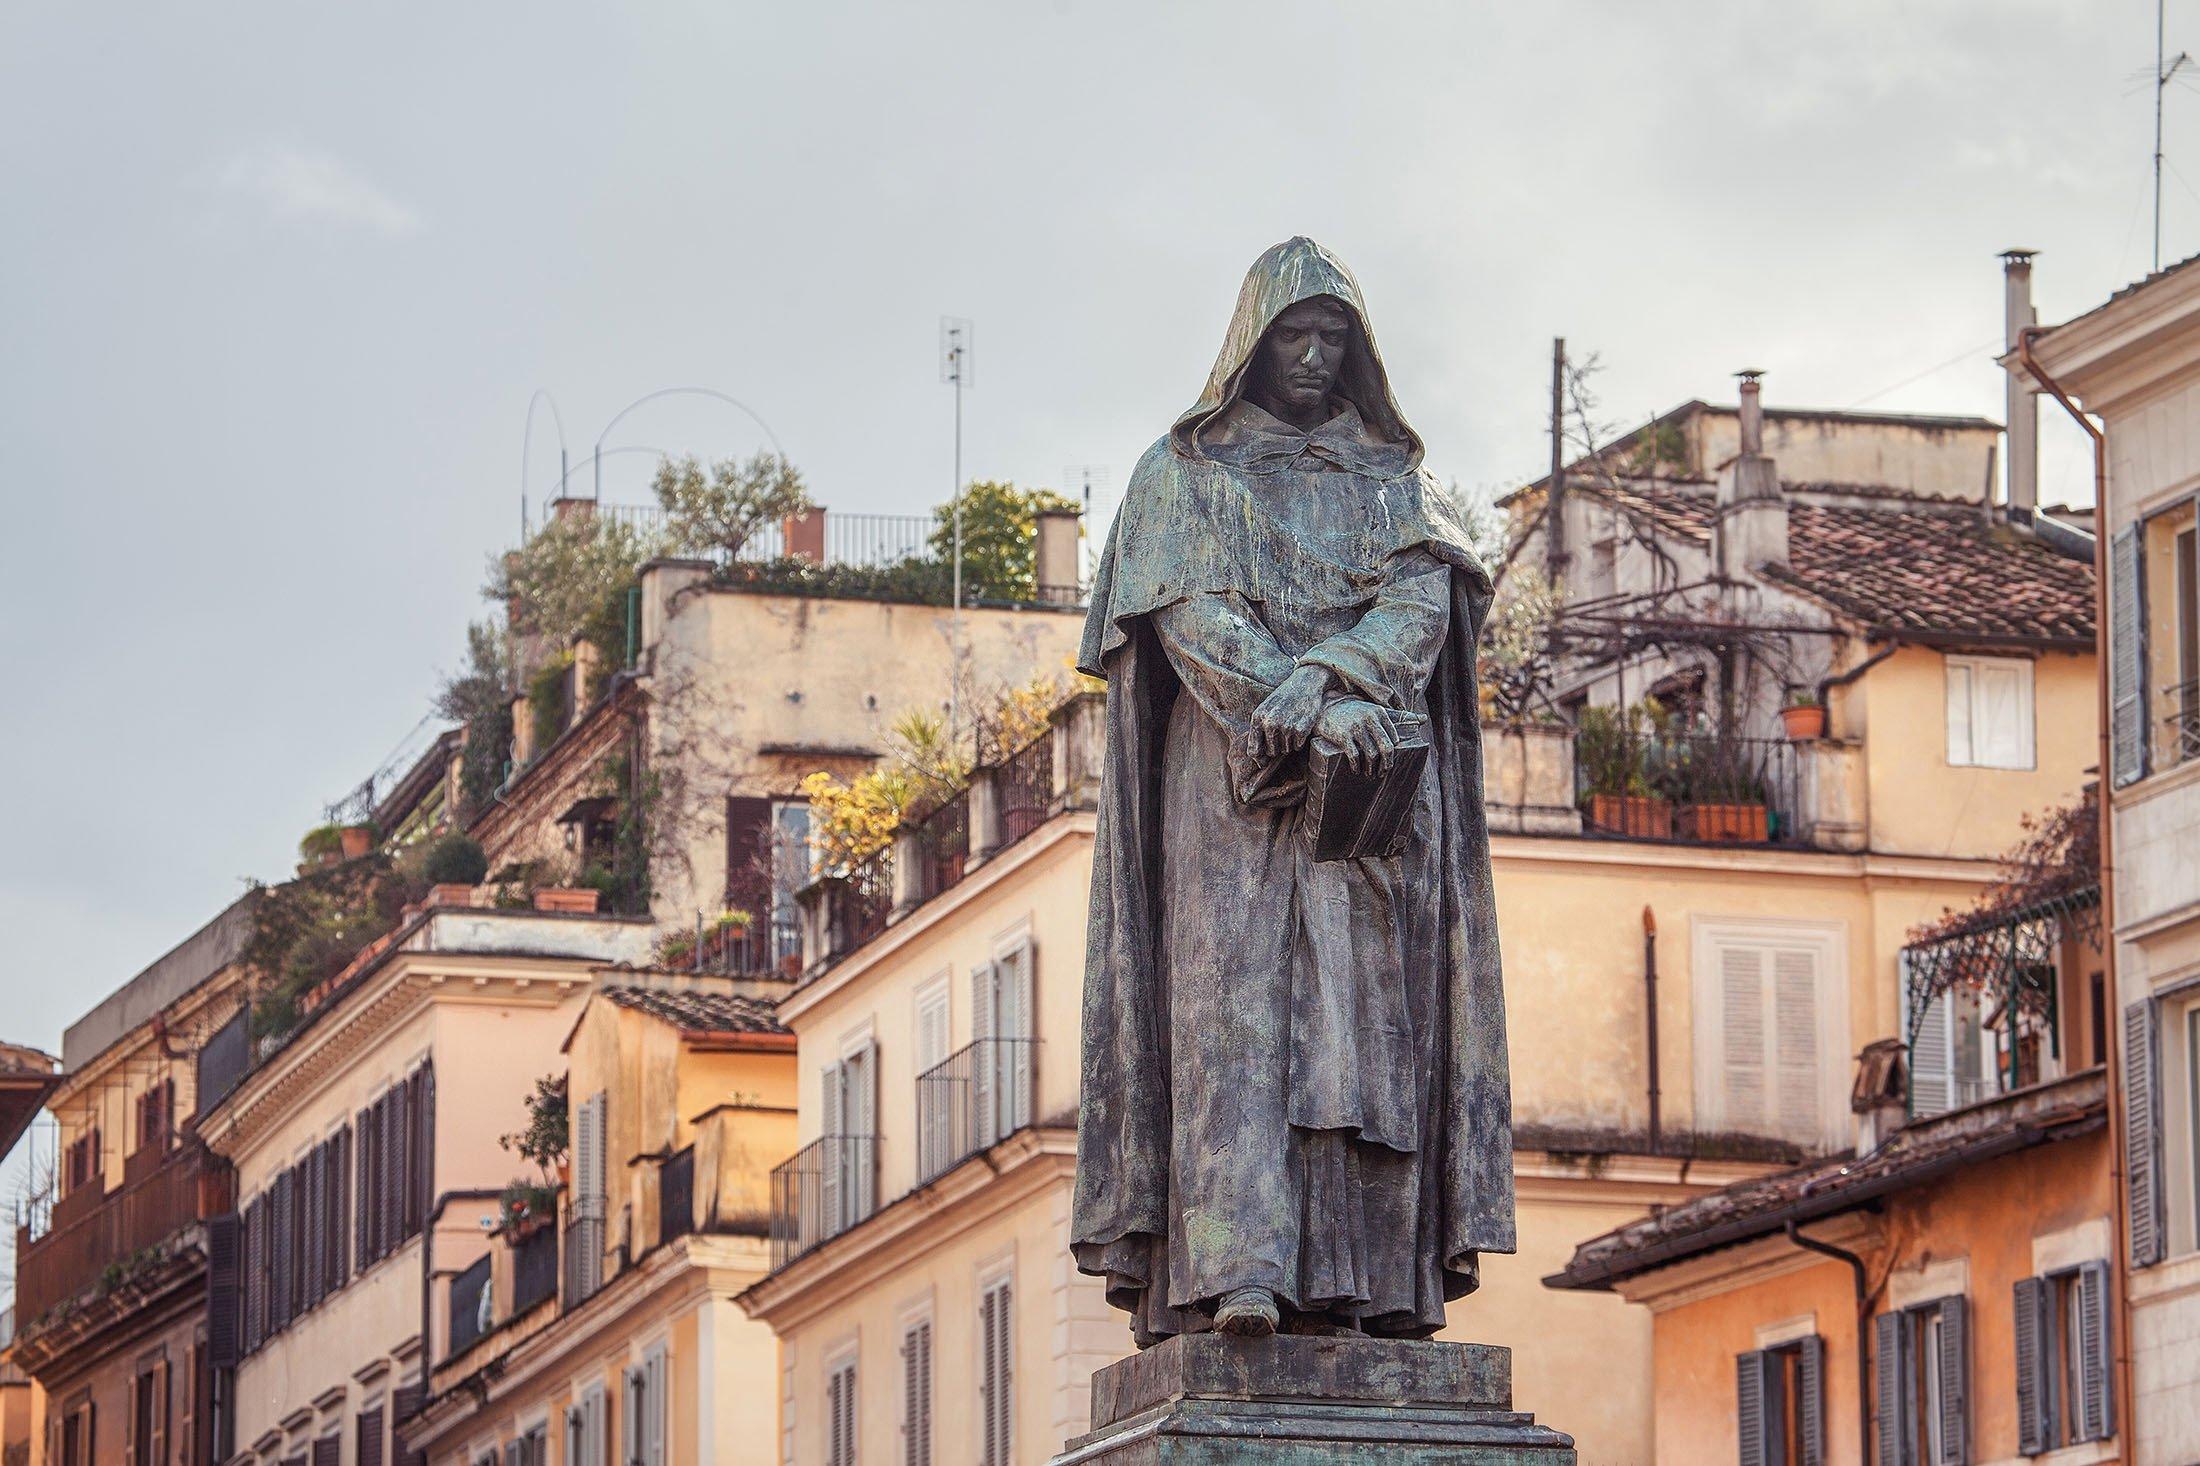 A statue ofGiordano Bruno,Italian Dominican philosopher, cosmological theoristand Hermetic occultist, stands atCampo de